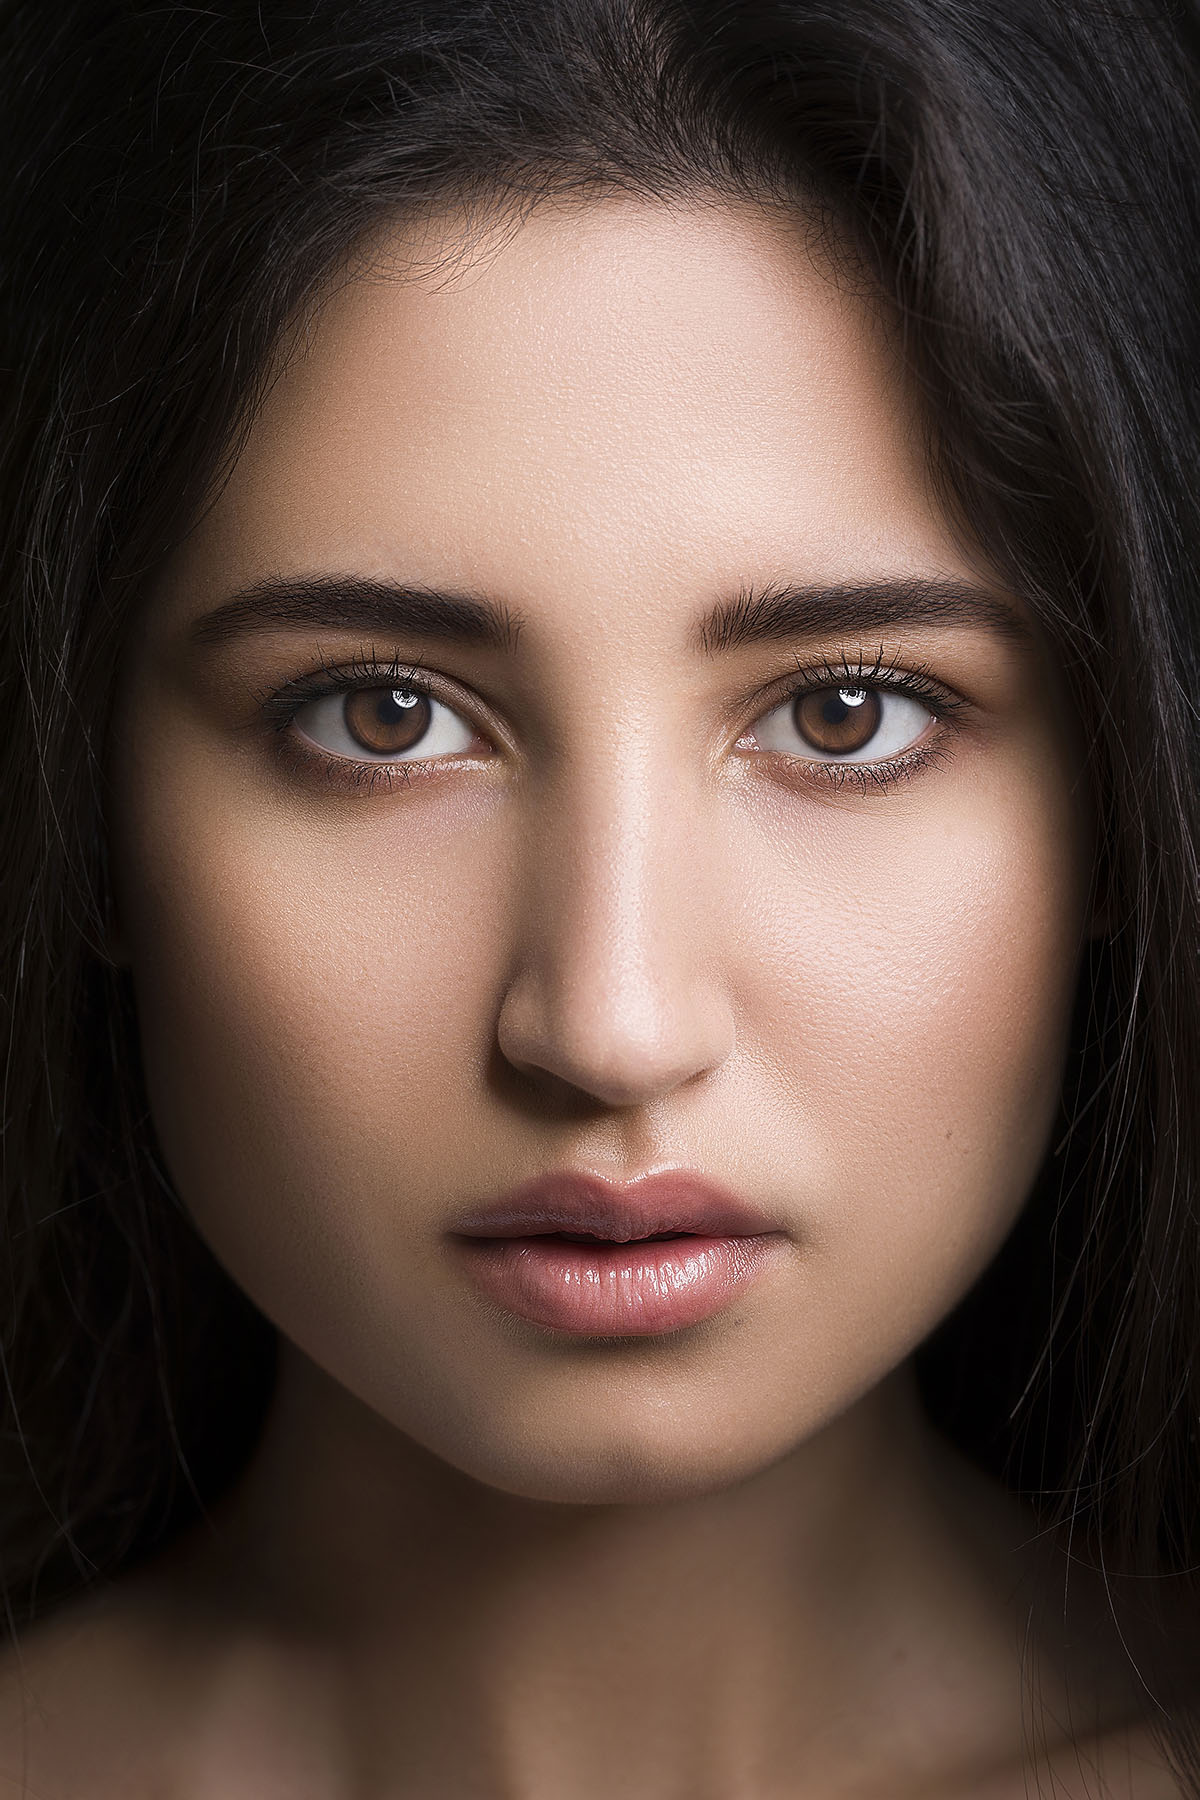 Beauty photoshoot by Loesje Kessels Fashion Photographer Dubai